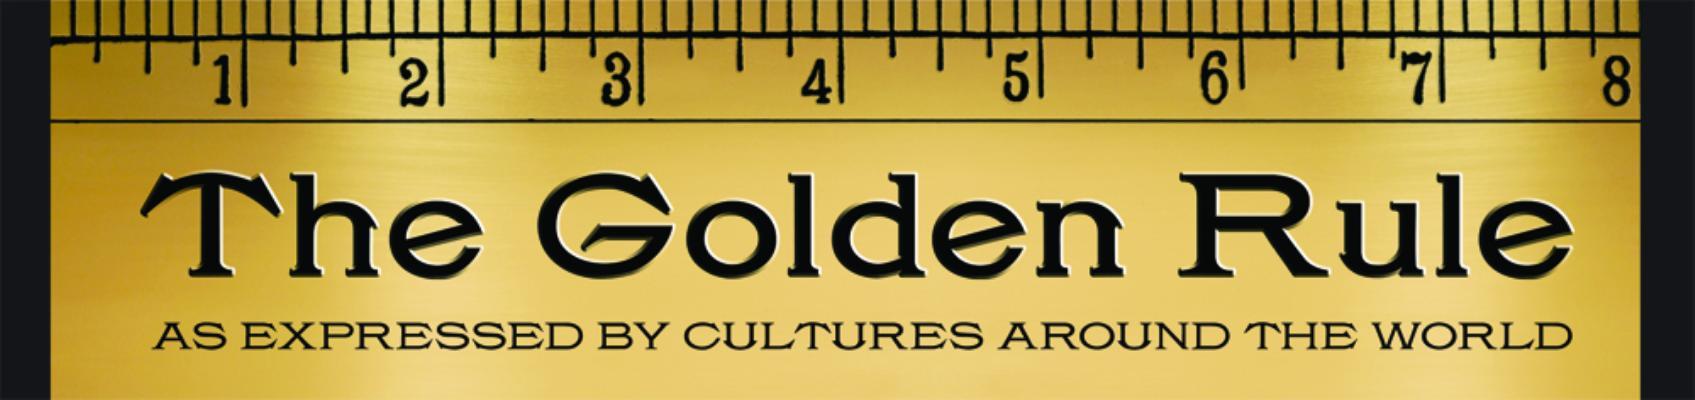 Image for Golden Rule